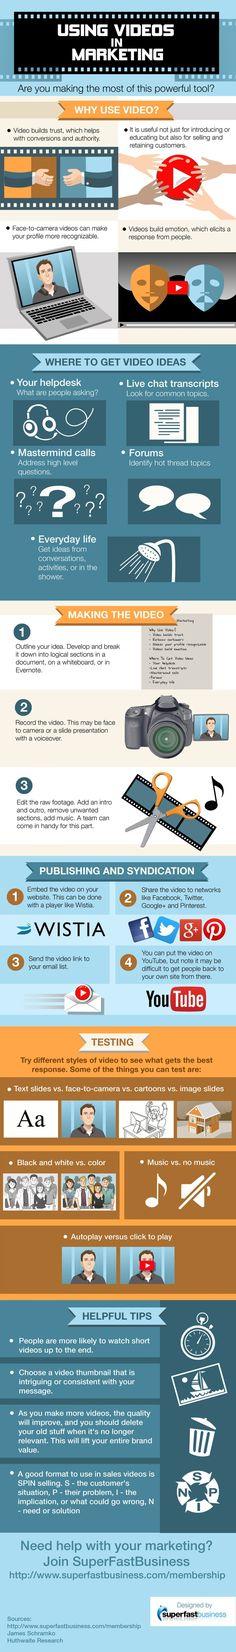 Using Videos in Marketing